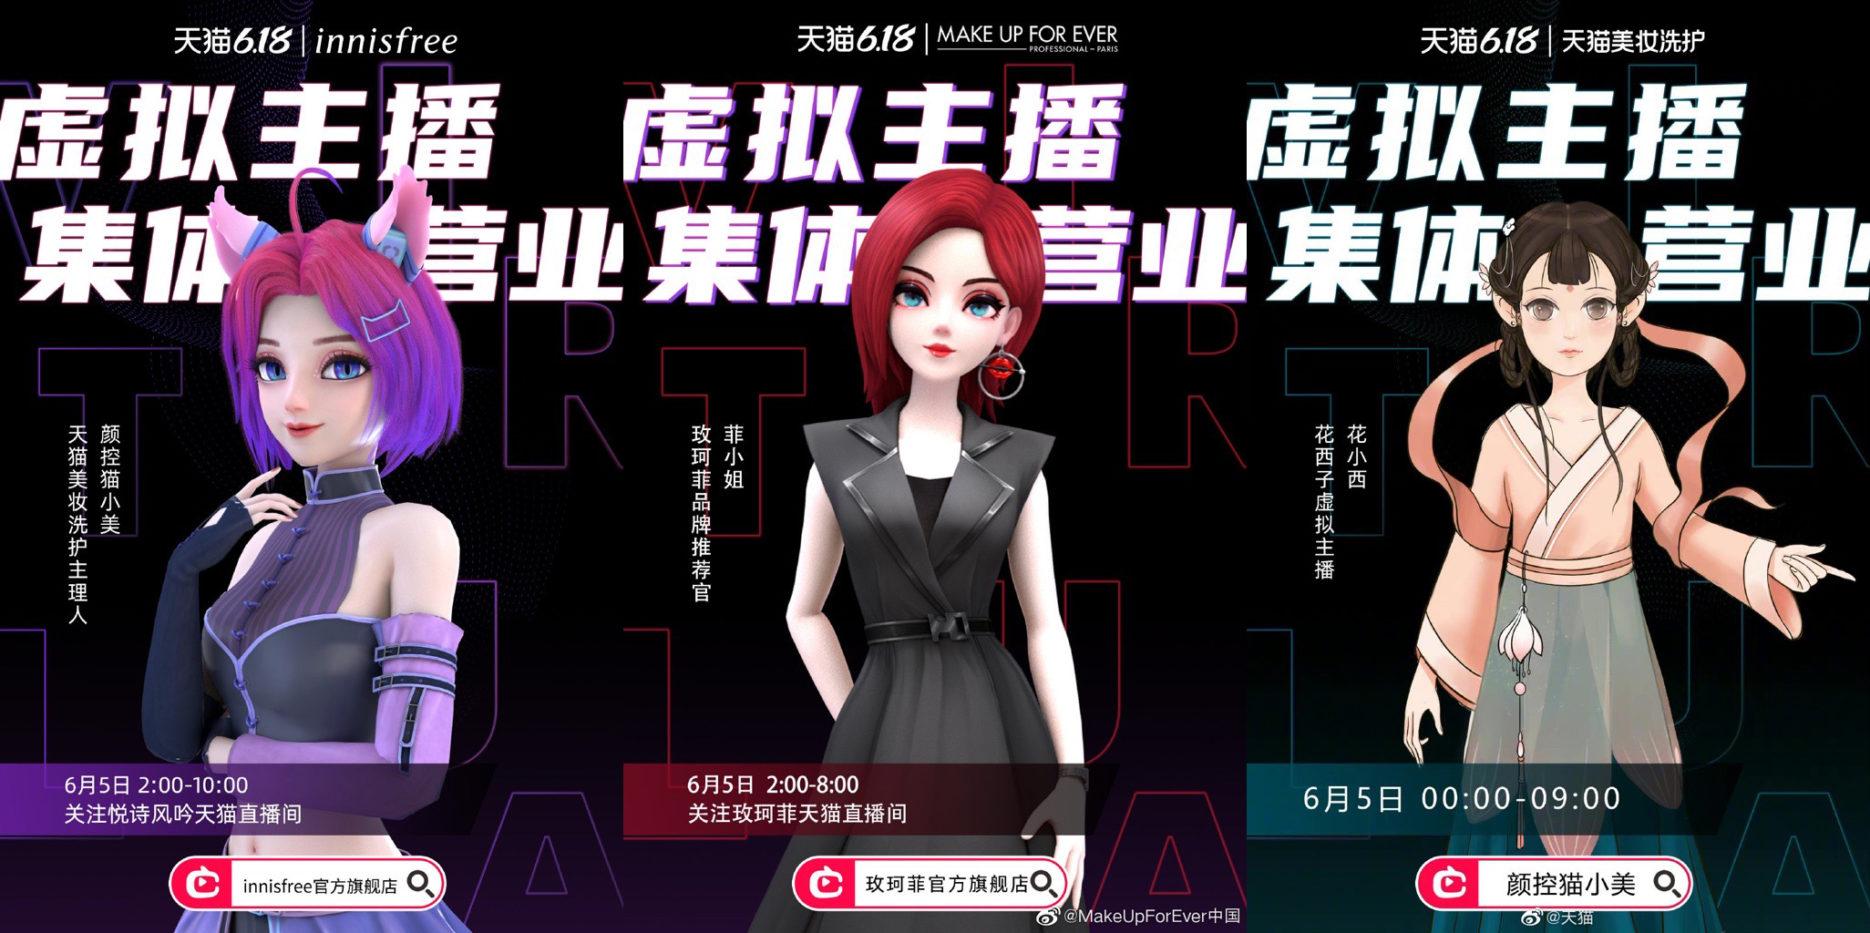 Virtual KOLs on Taobao. Credit: Taobao